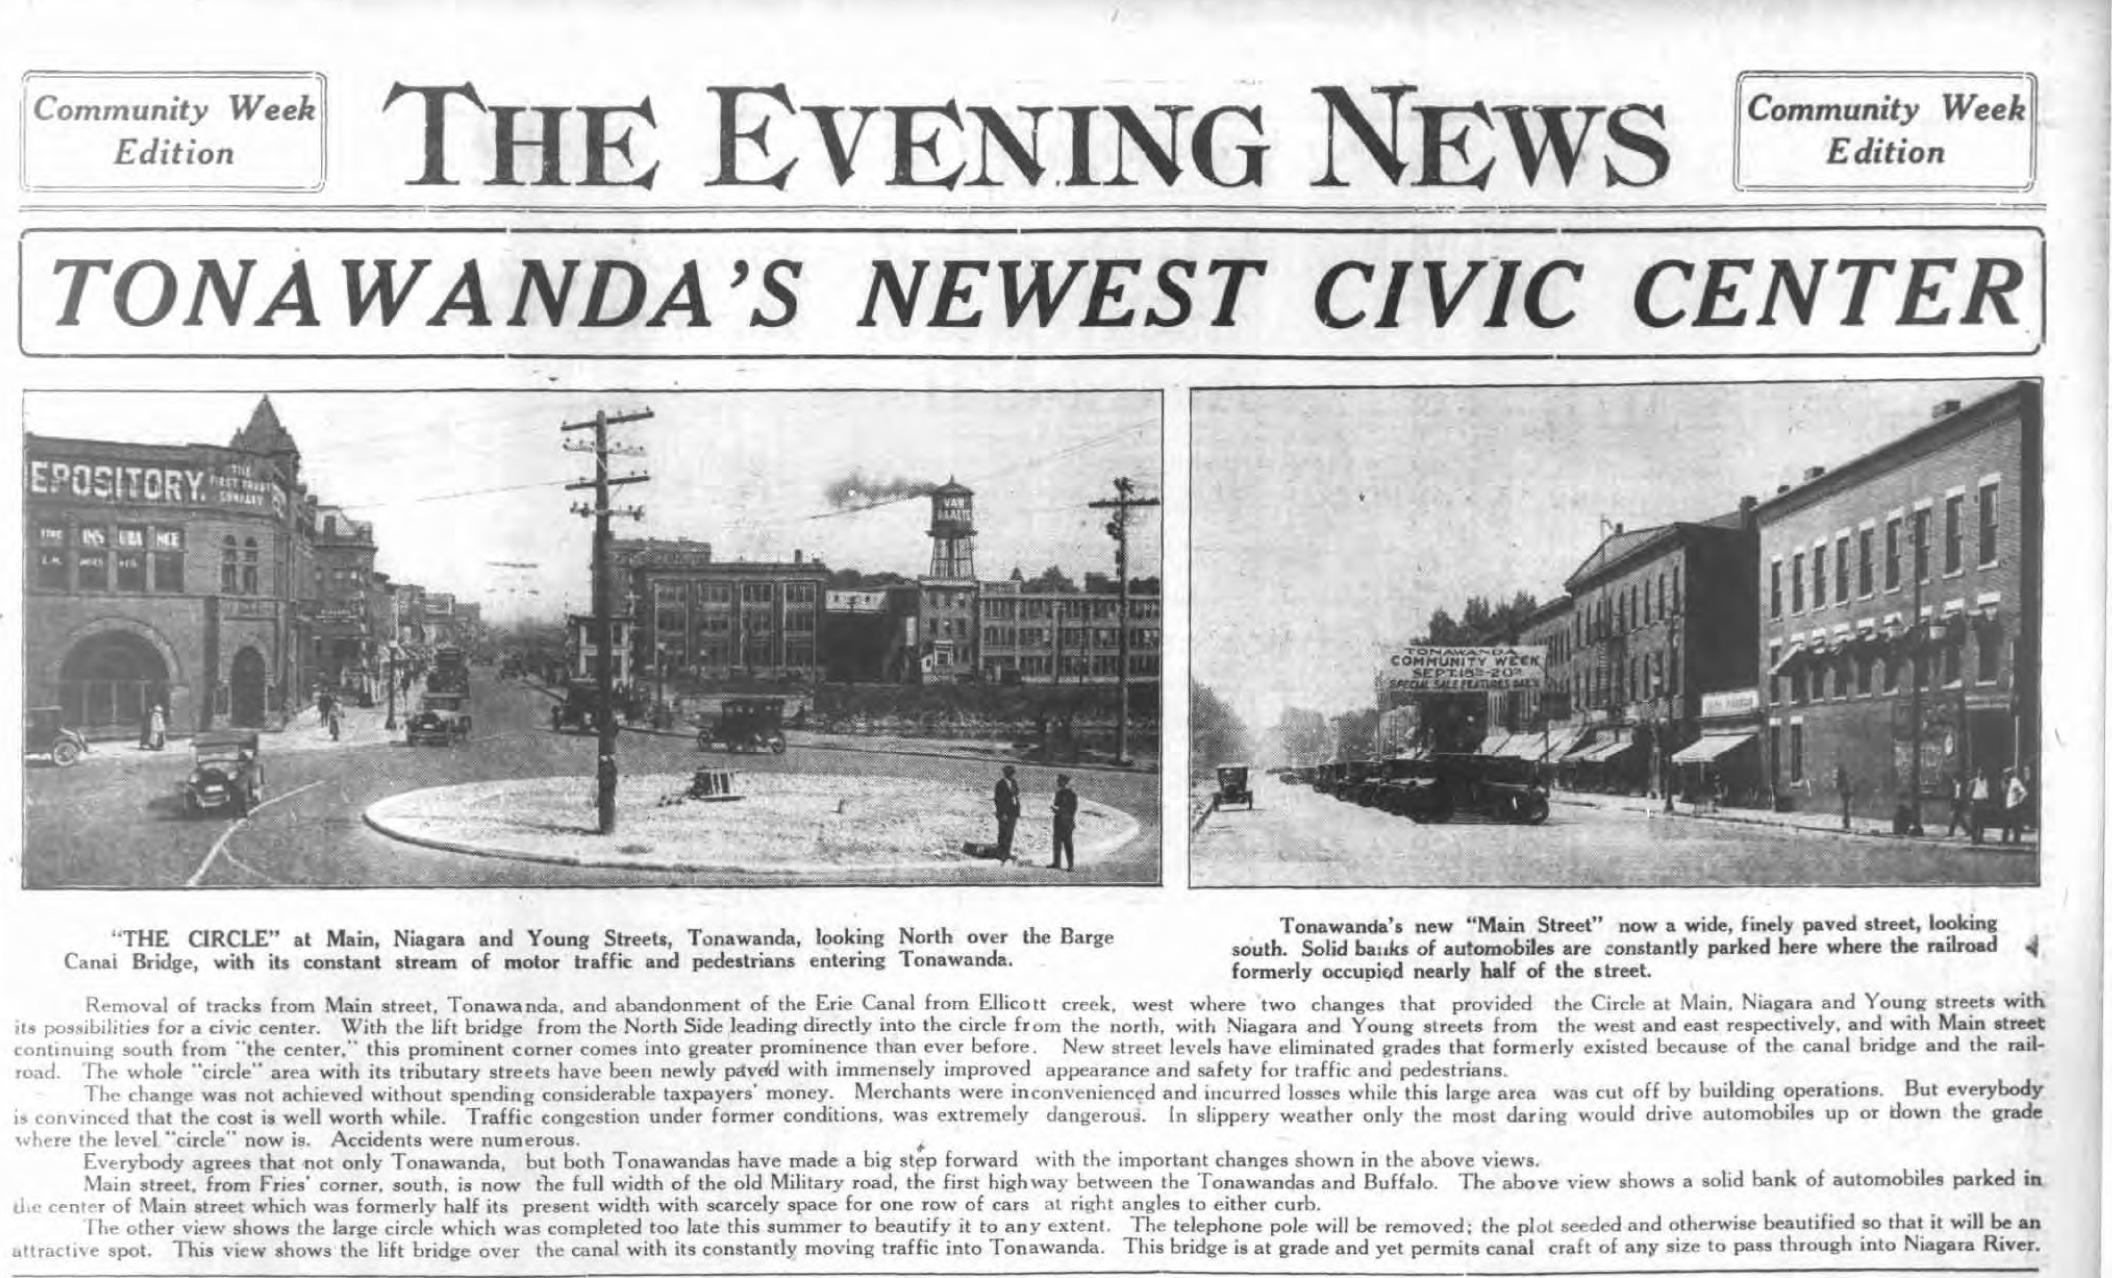 Tonawandas Newest Civic Center, photos and article (Ton News 1924).png